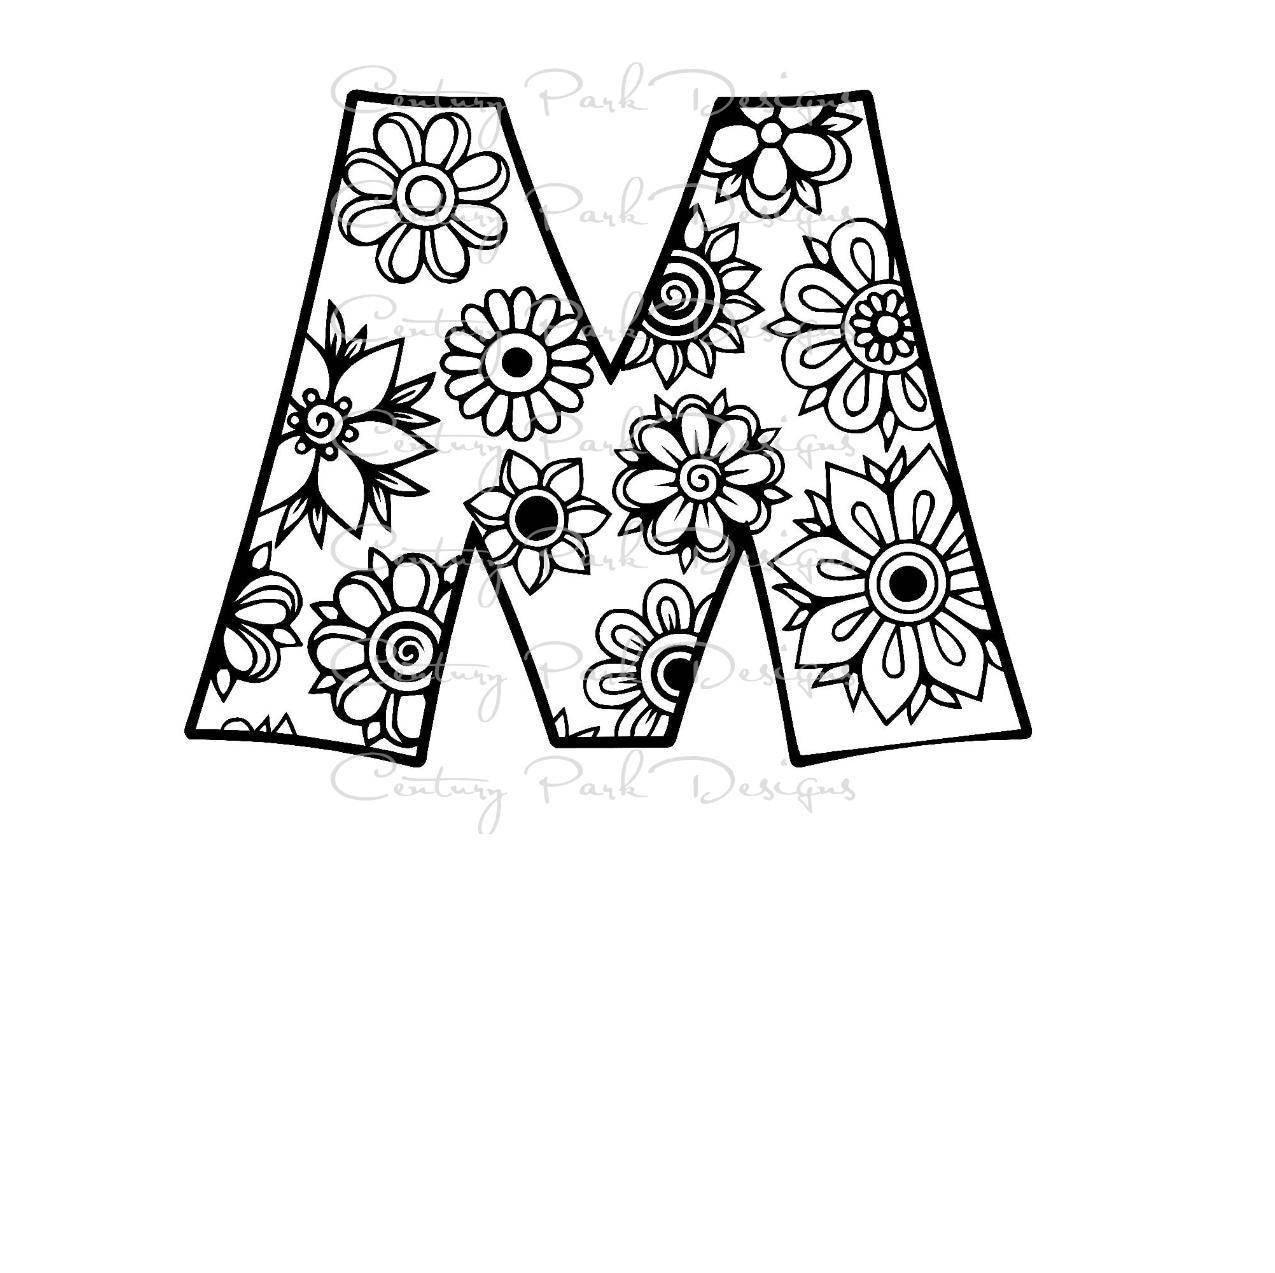 fancy mandala coloring pages - photo#37